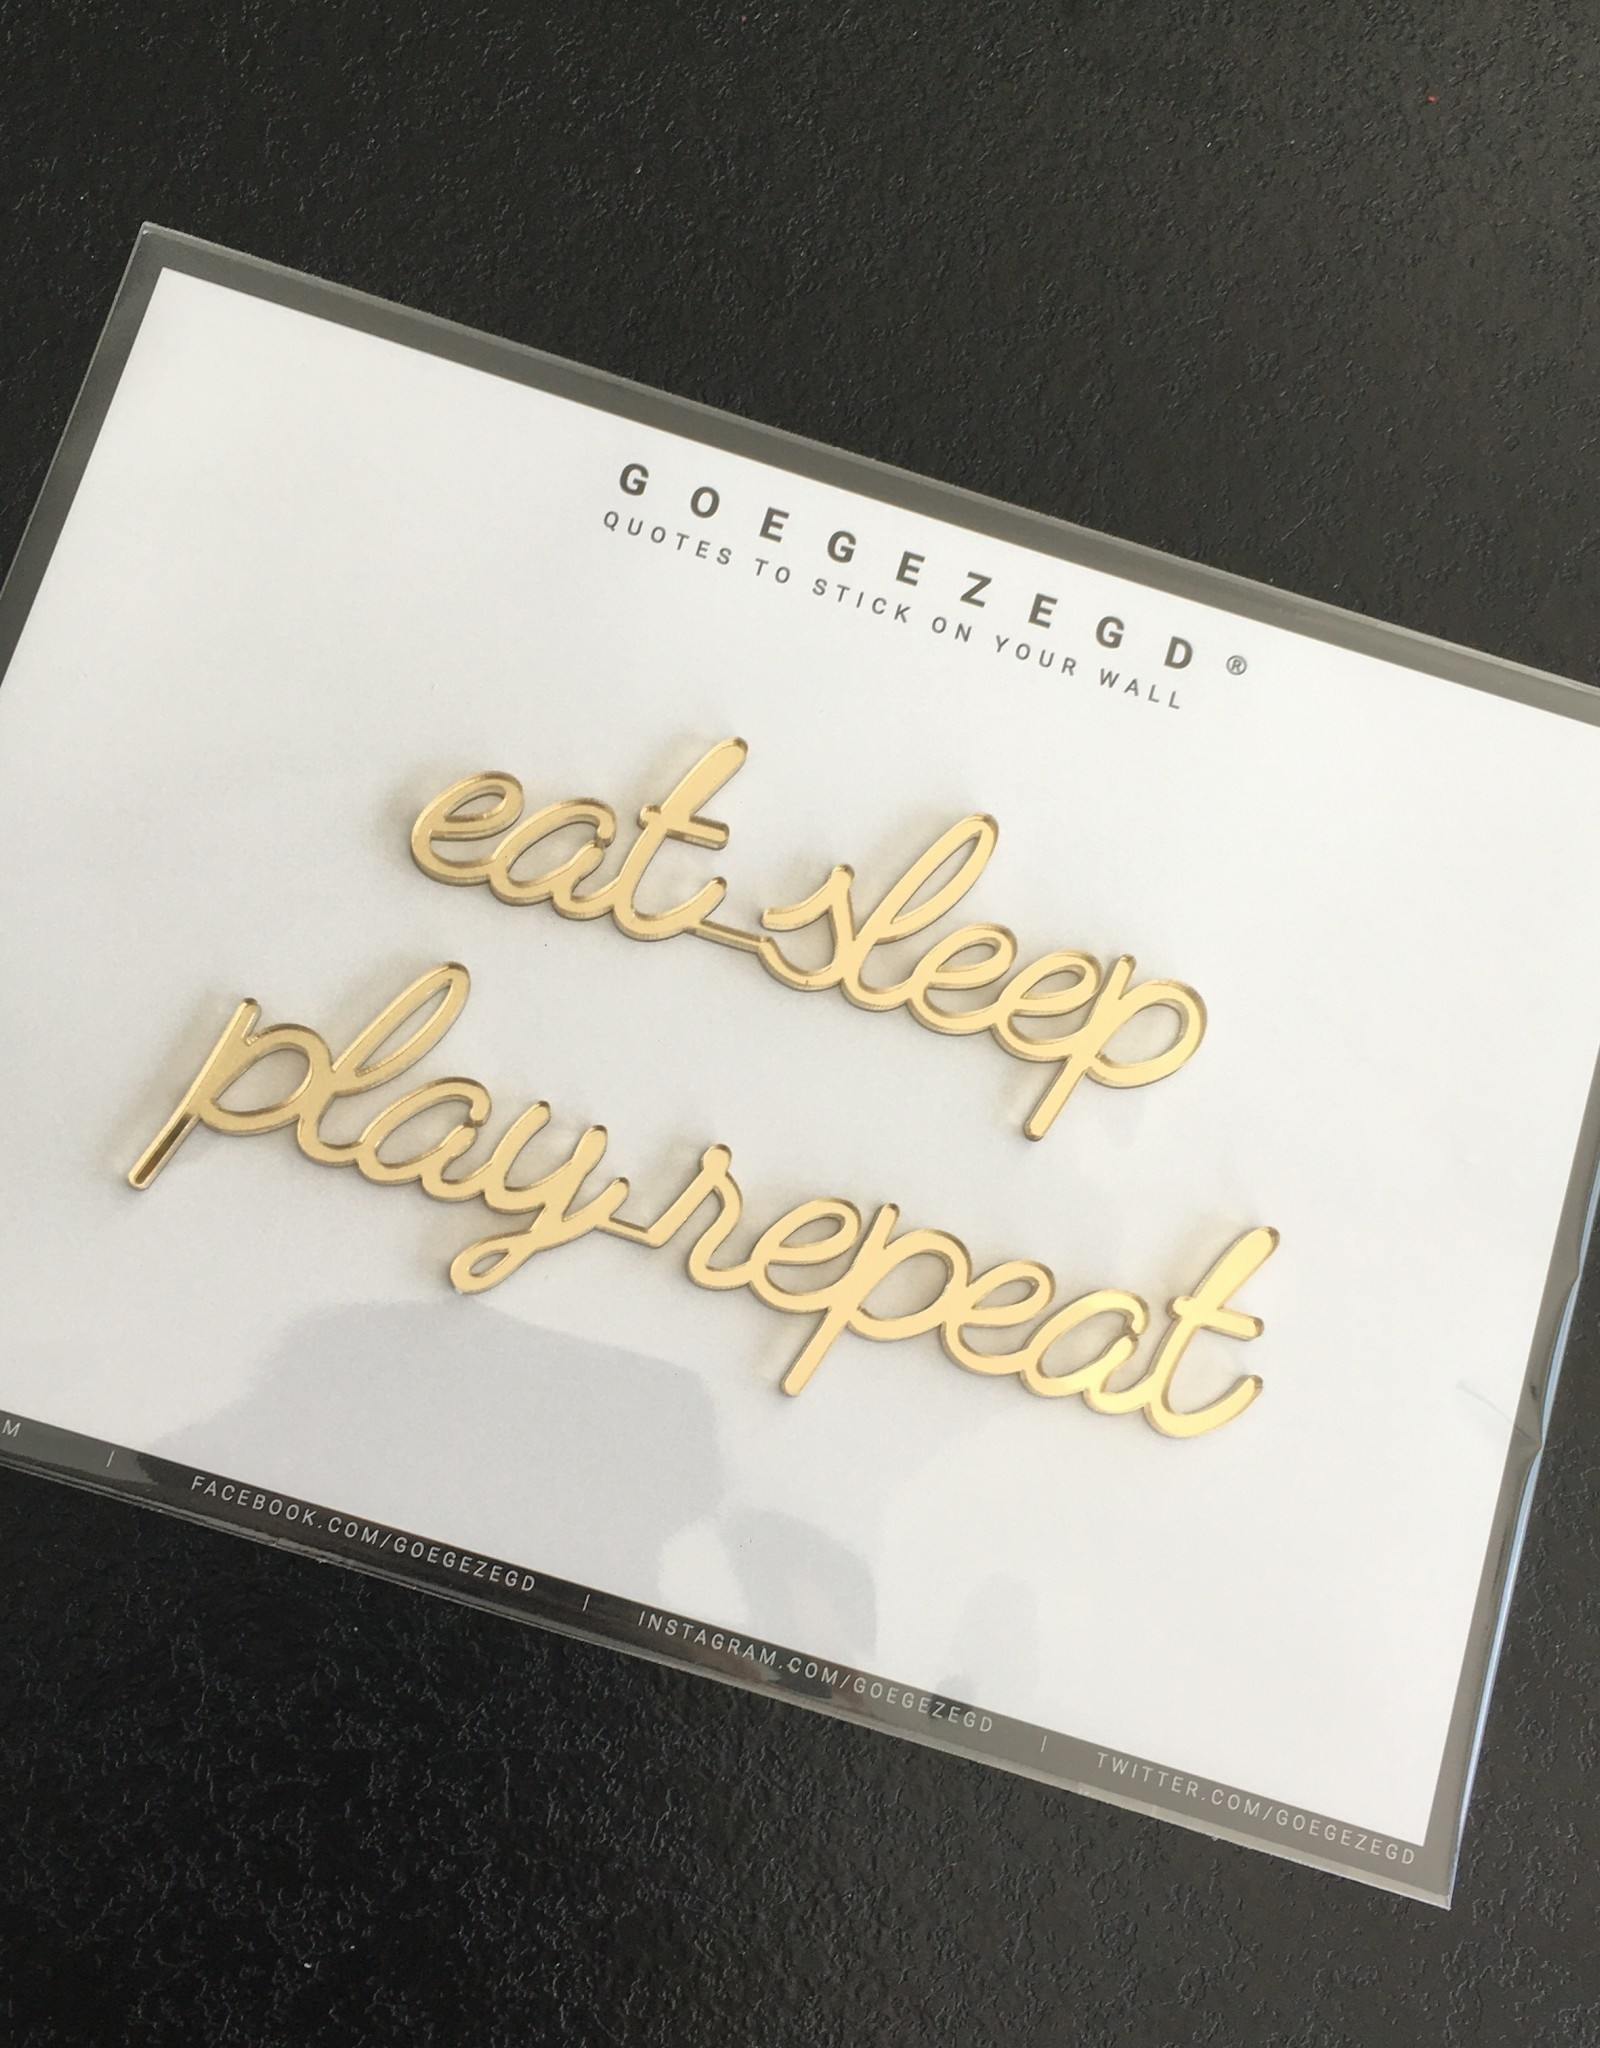 Goegezegd Goegezegd muursticker a5 goud eat sleep play repeat